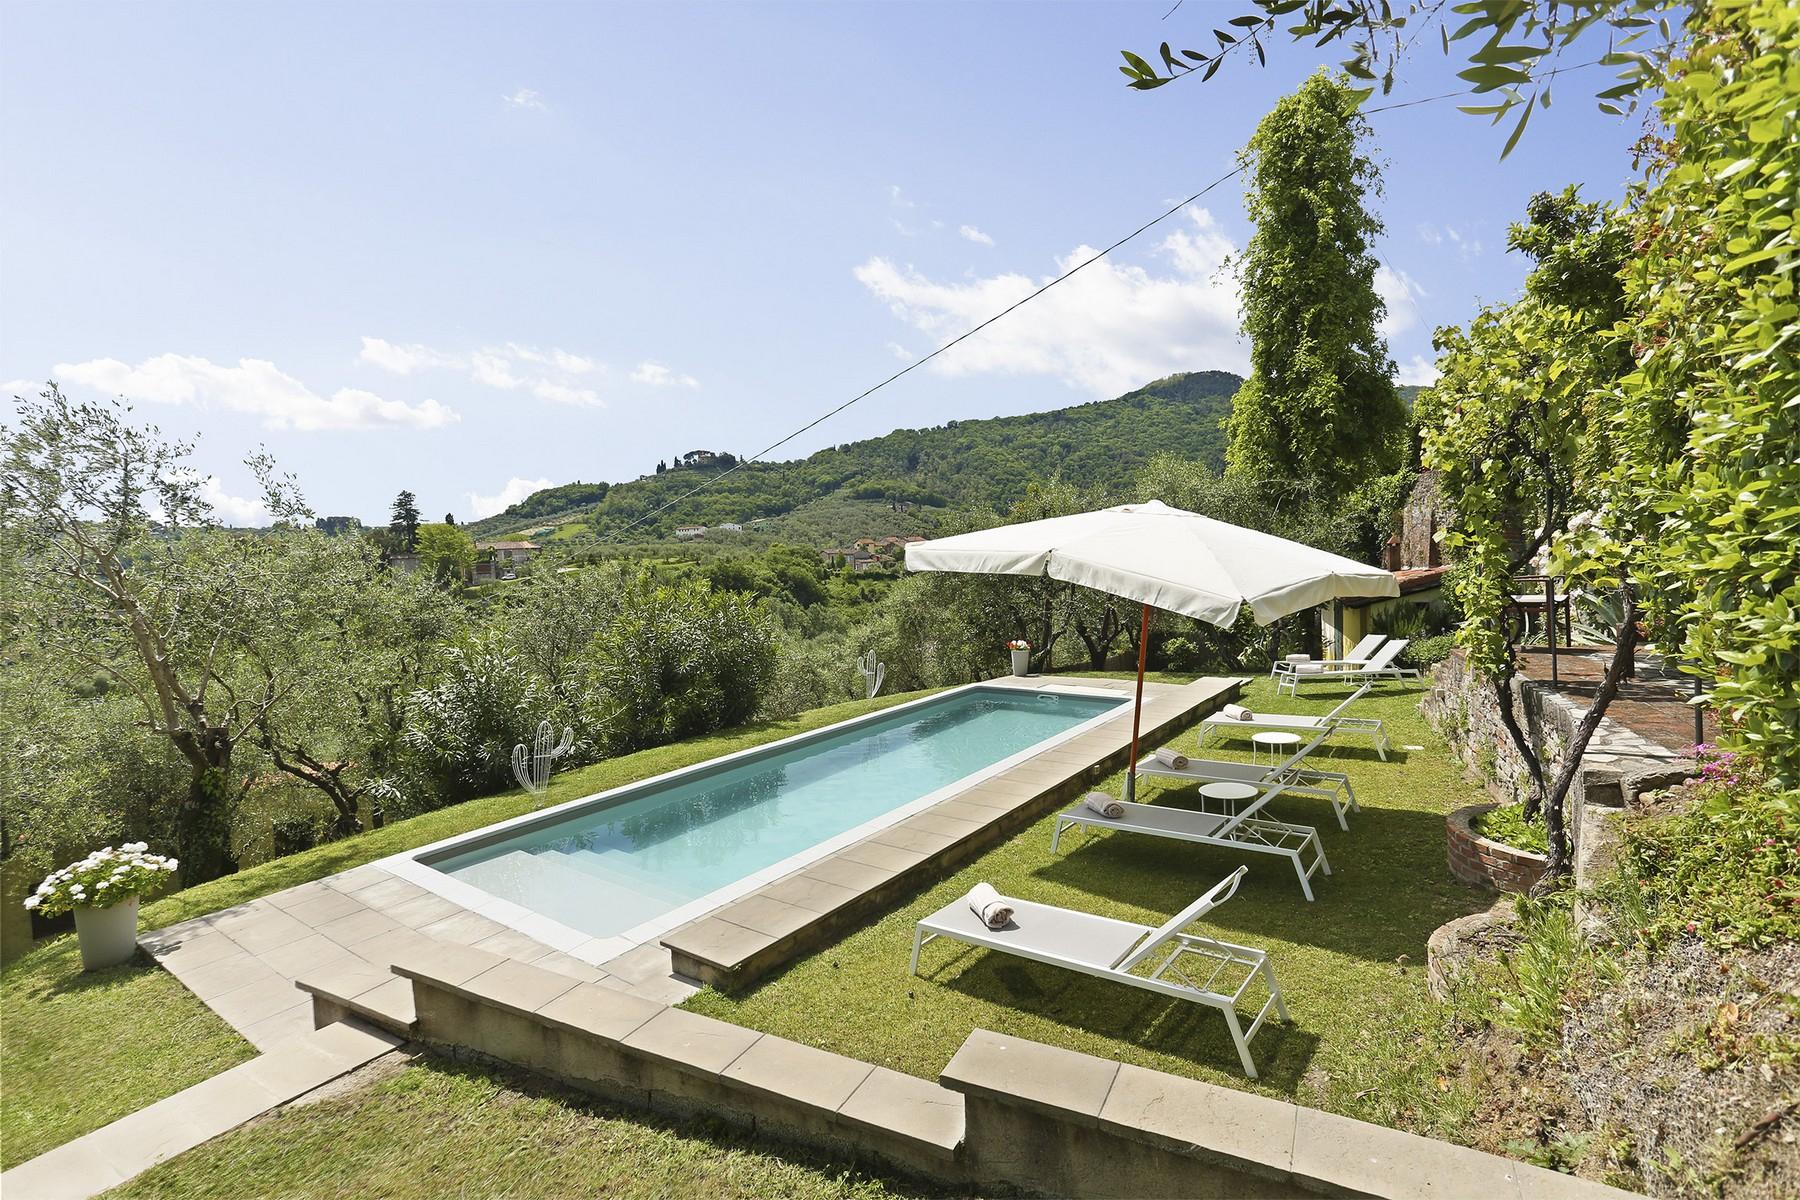 Villa in Vendita a Lucca: 5 locali, 735 mq - Foto 2